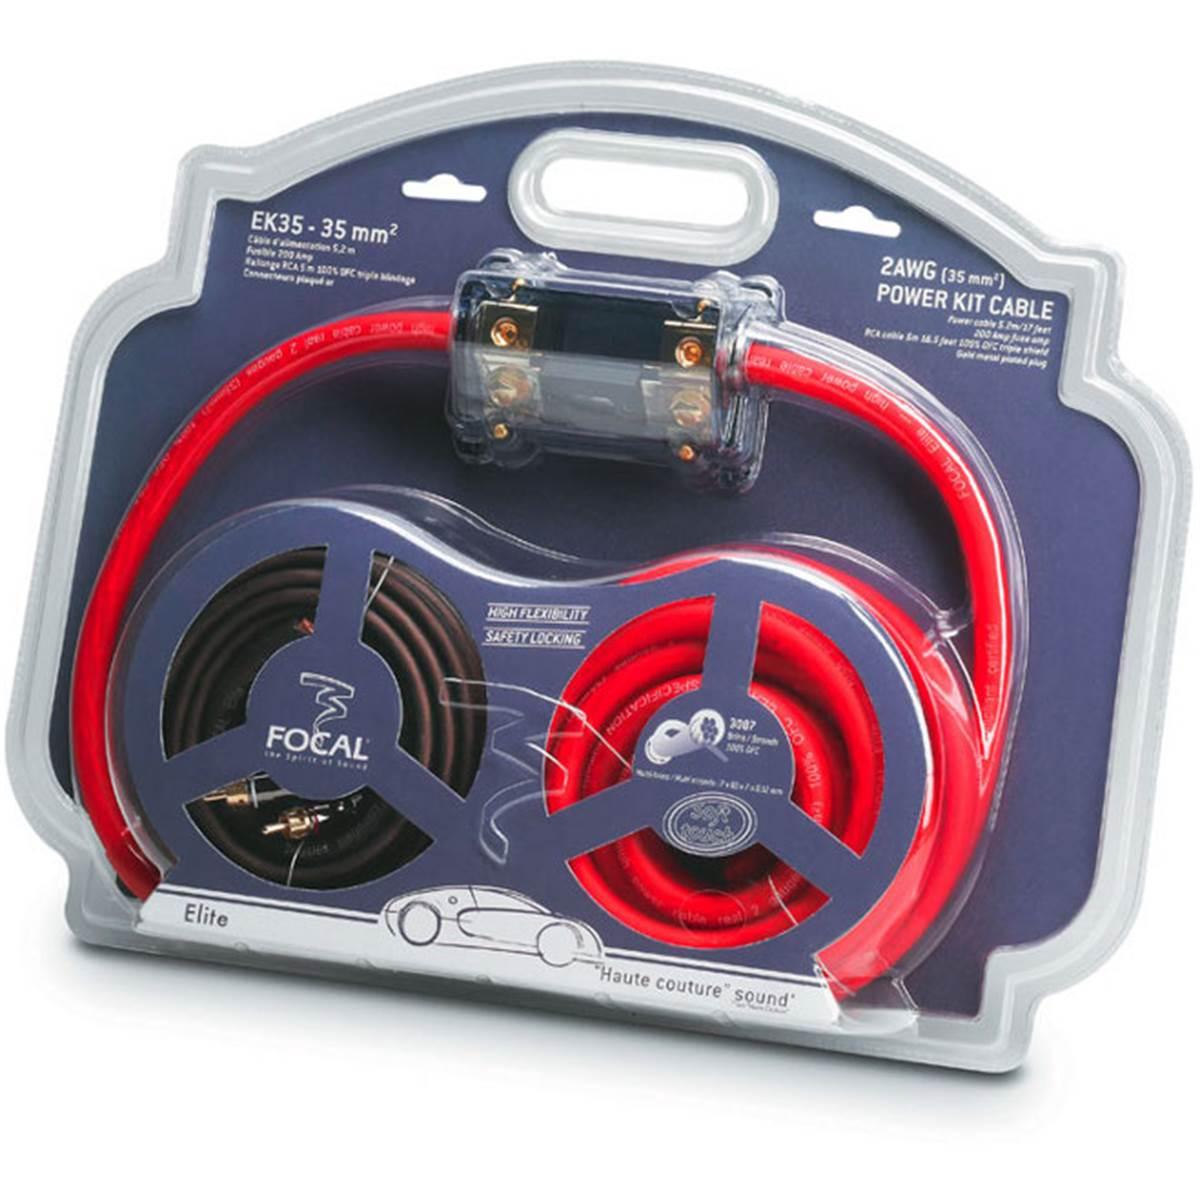 Kit d'alimentation amplificateur 35 mm² Focal Elite EK 35